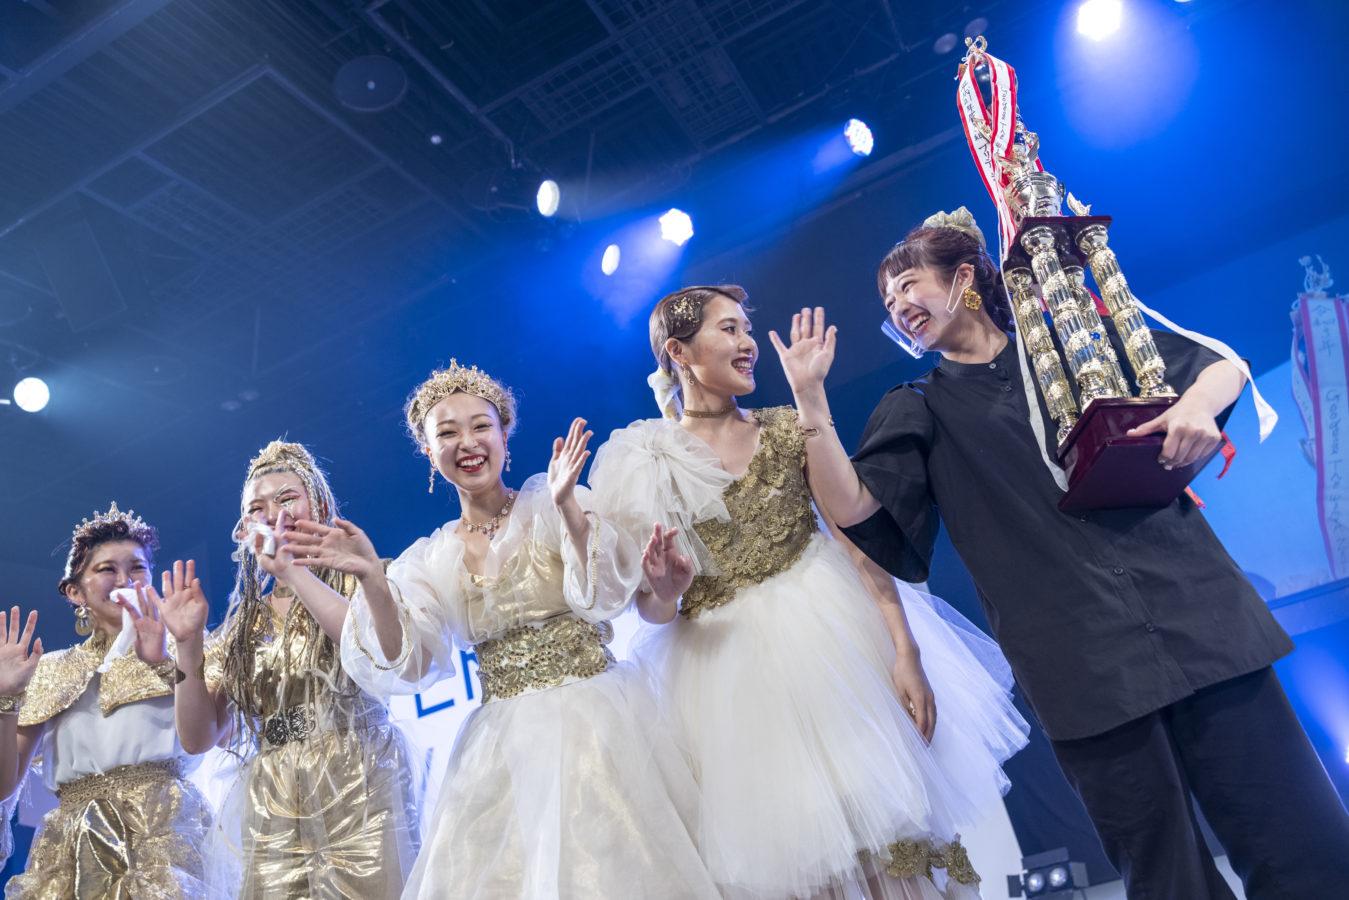 【LIVE配信】Power Festival 2021 開催報告